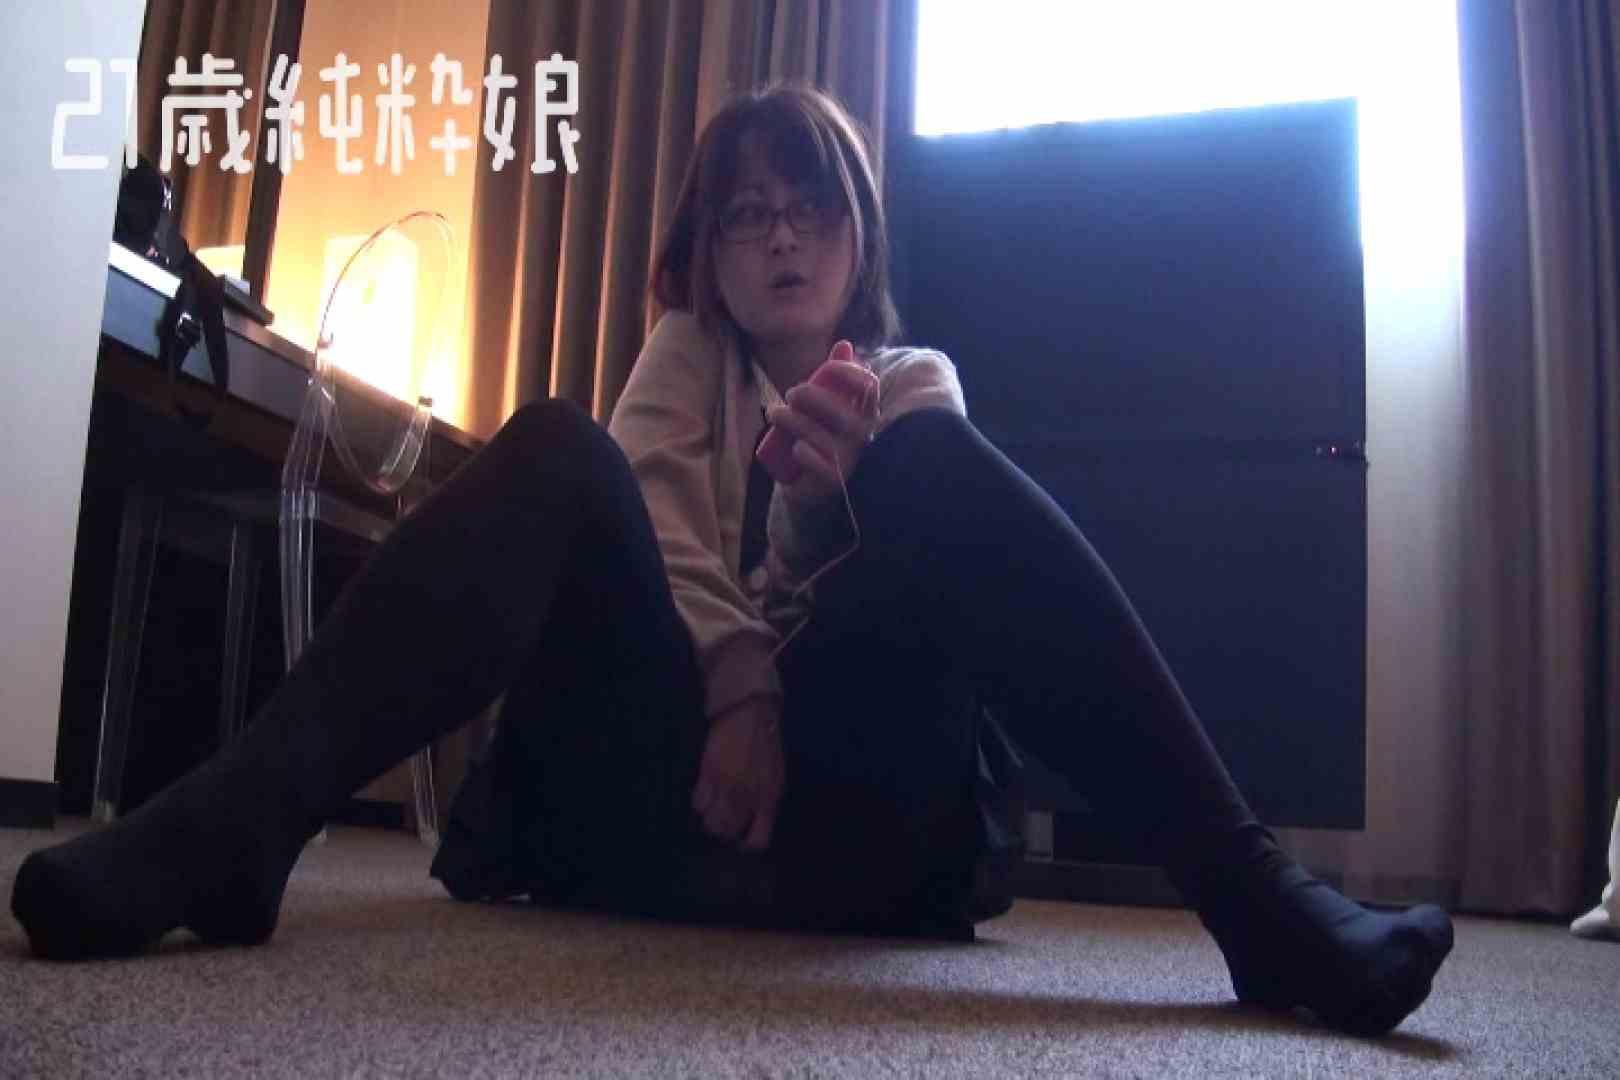 Gカップ21歳純粋嬢第2弾Vol.3 一般投稿 オマンコ動画キャプチャ 50pic 8